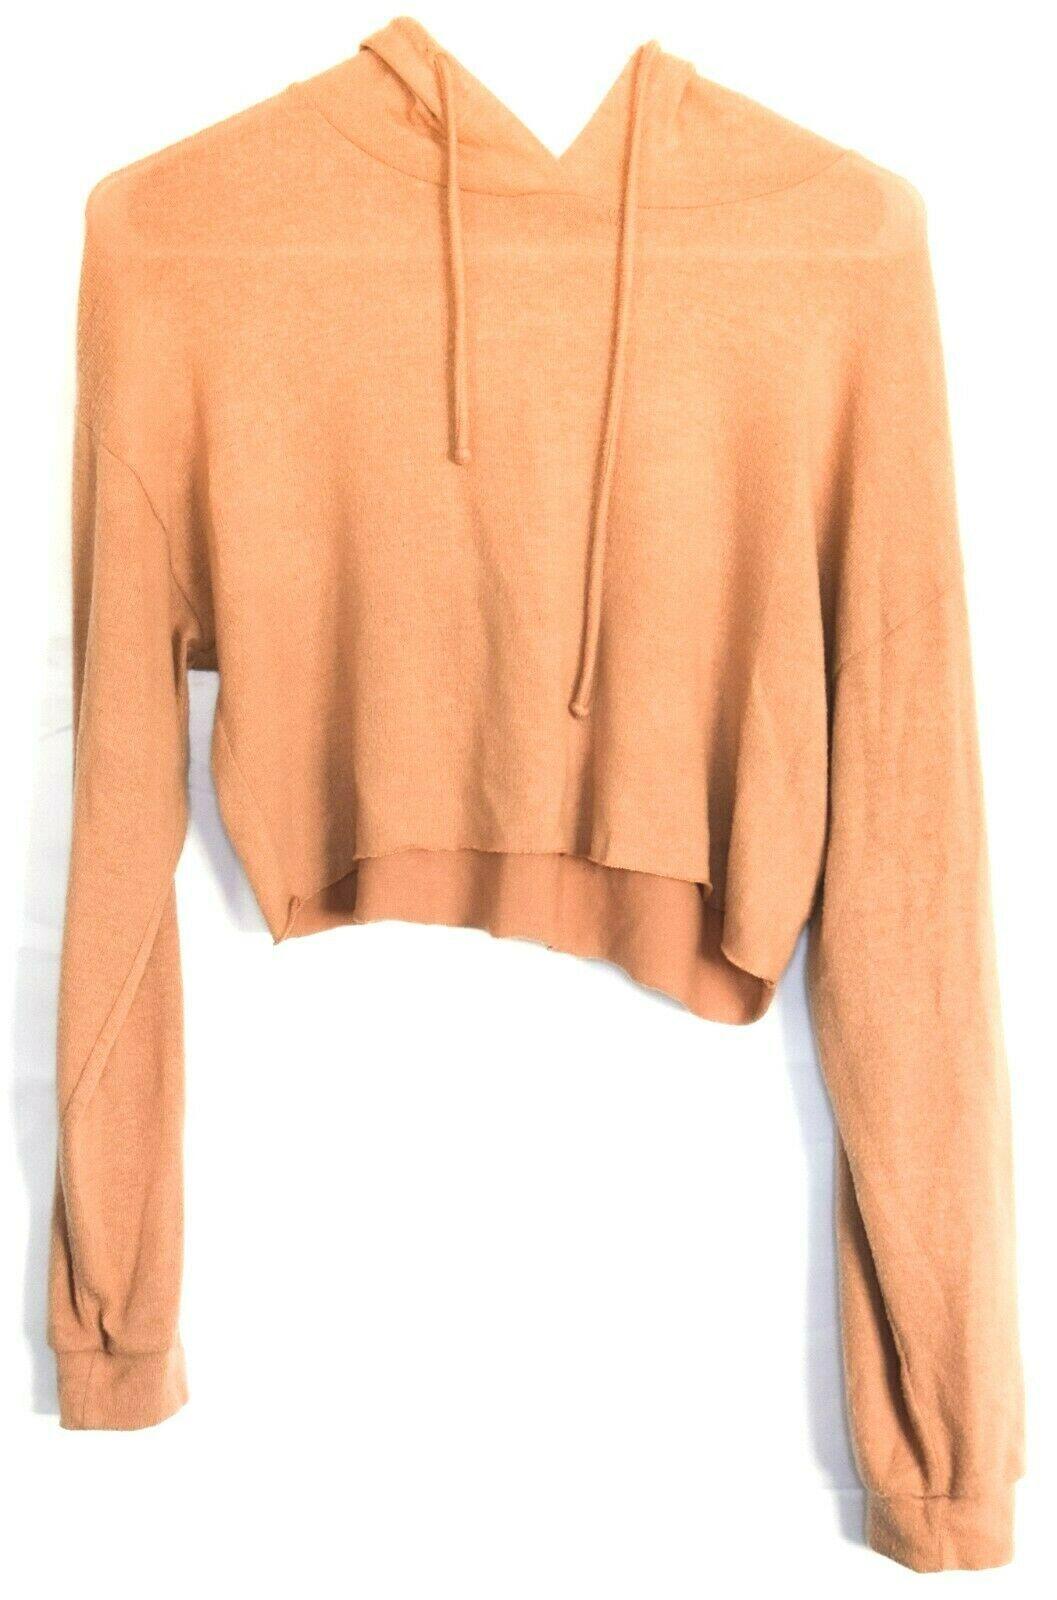 Forever 21 Terra Cotta Orange Raw Hem Cropped Long Sleeve Hooded Top Size S